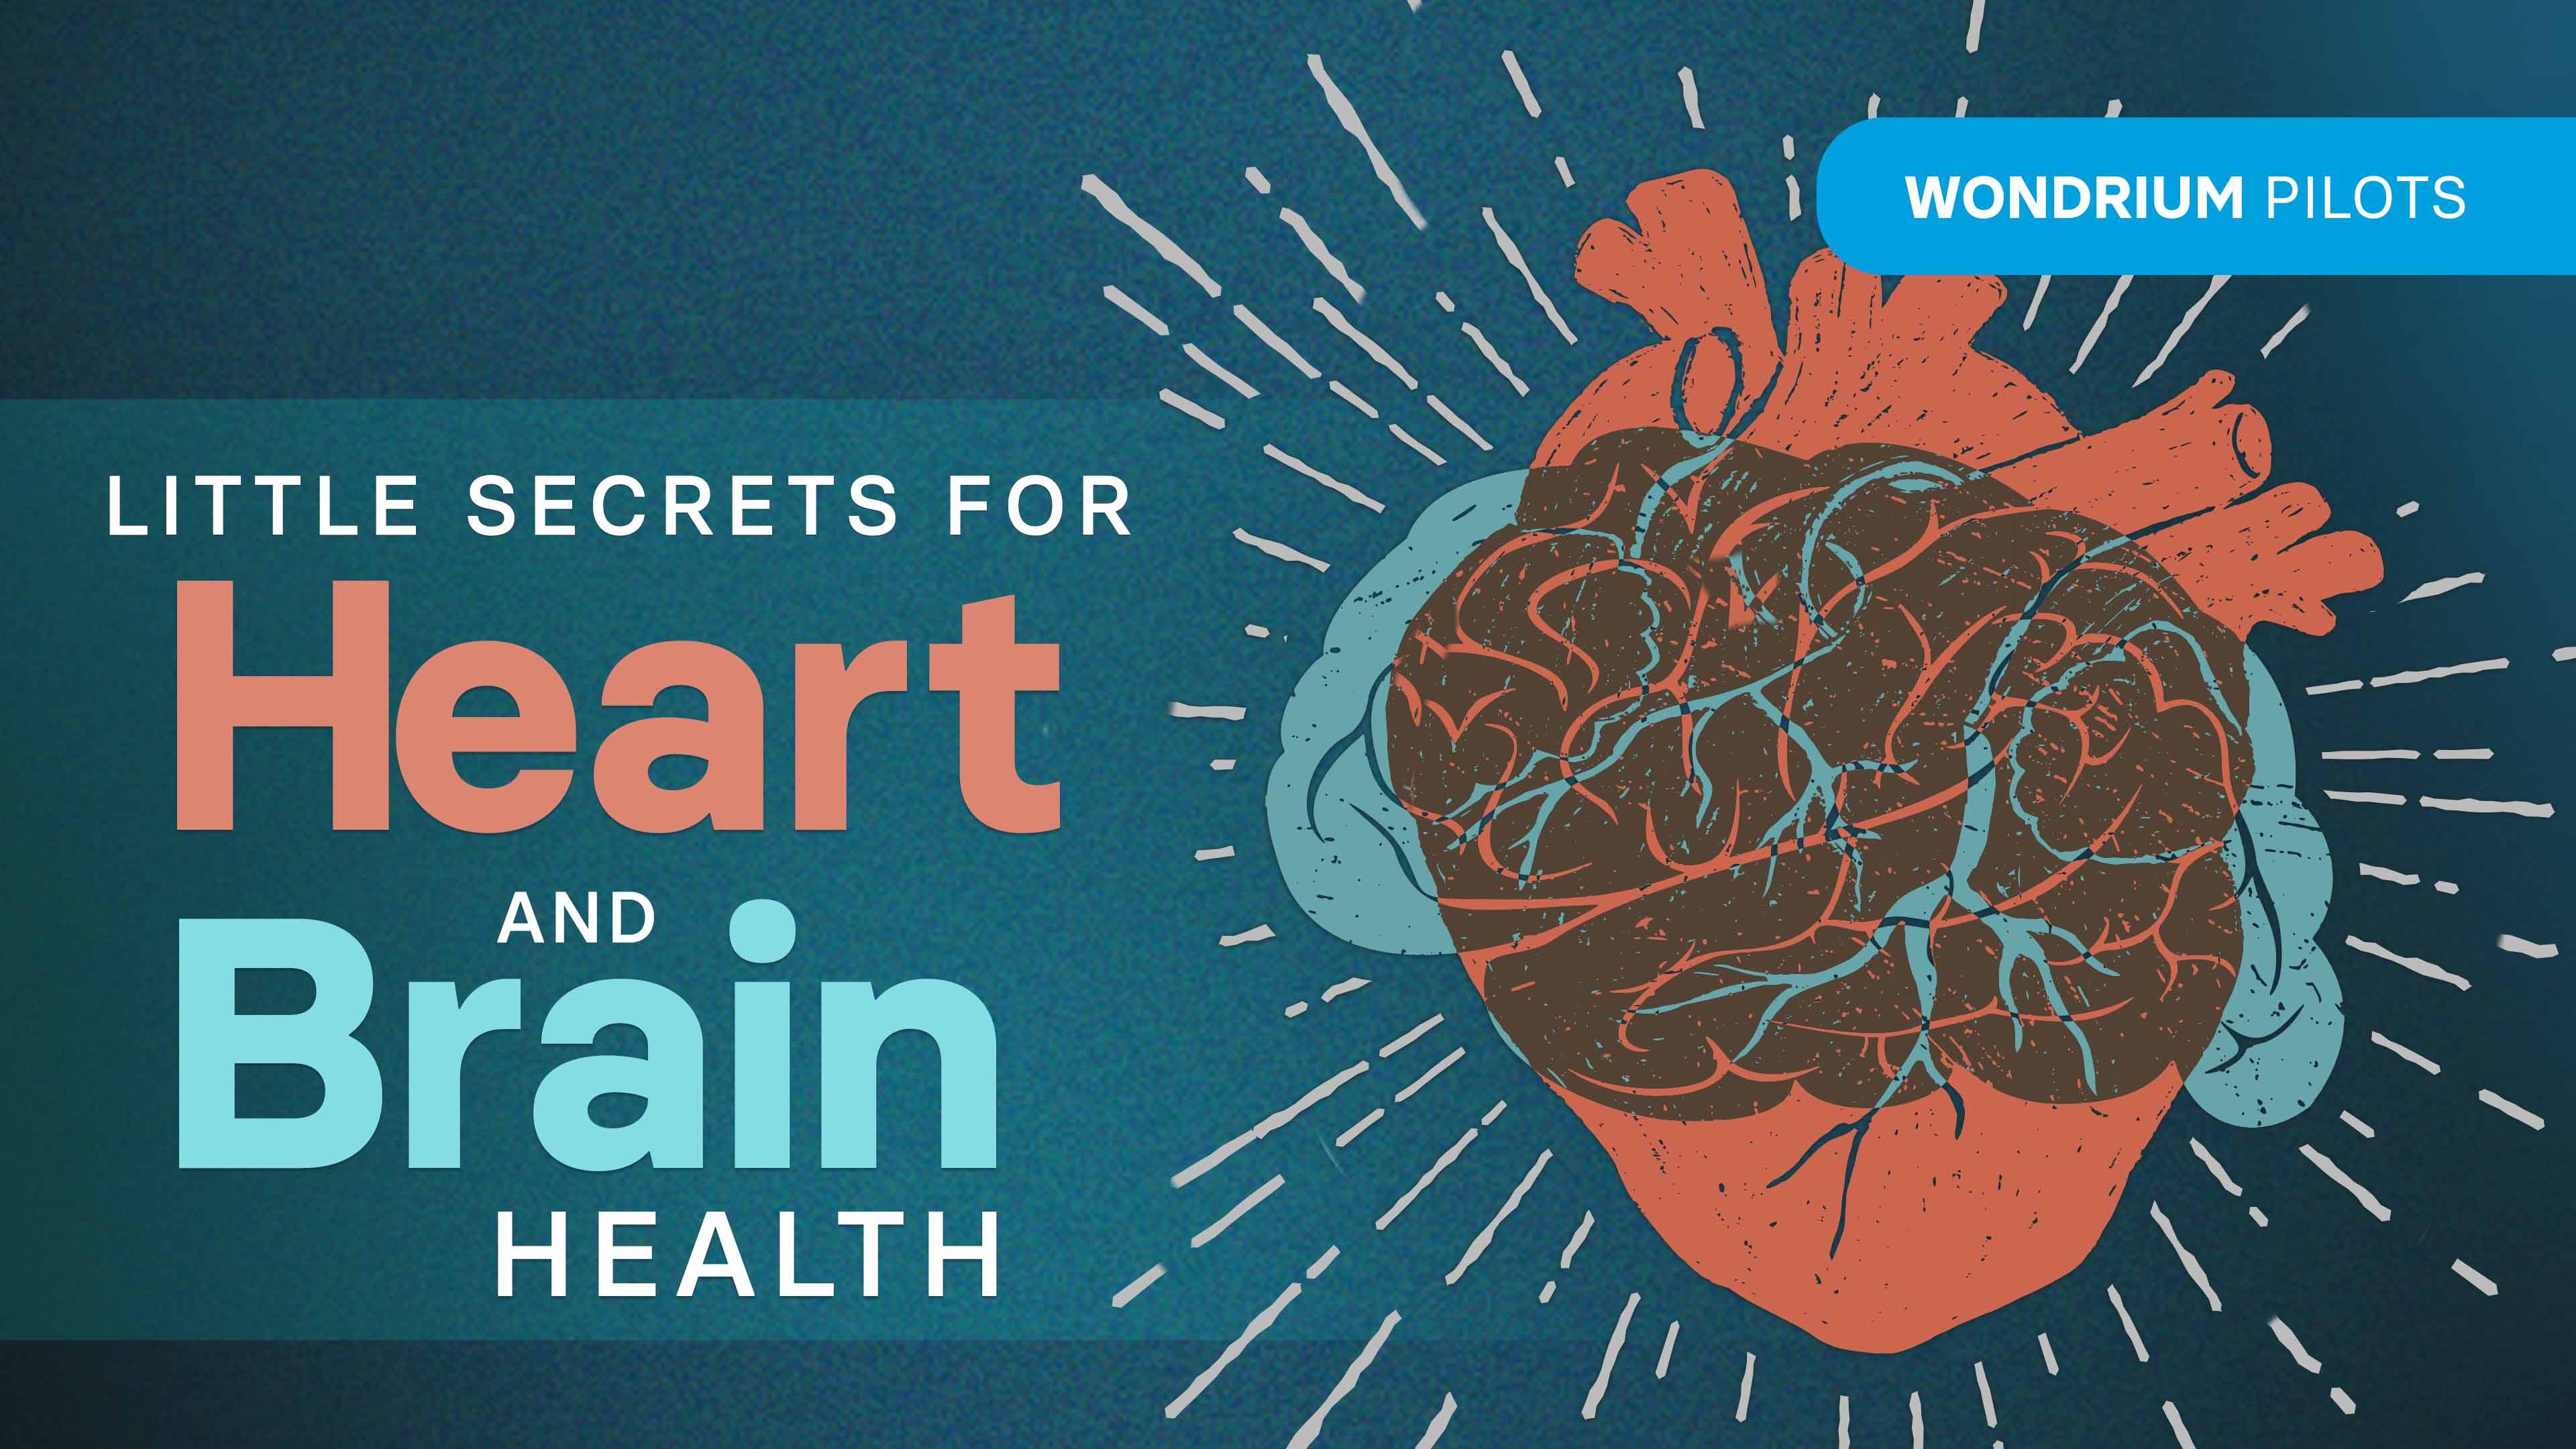 Little Secrets for Heart and Brain Health